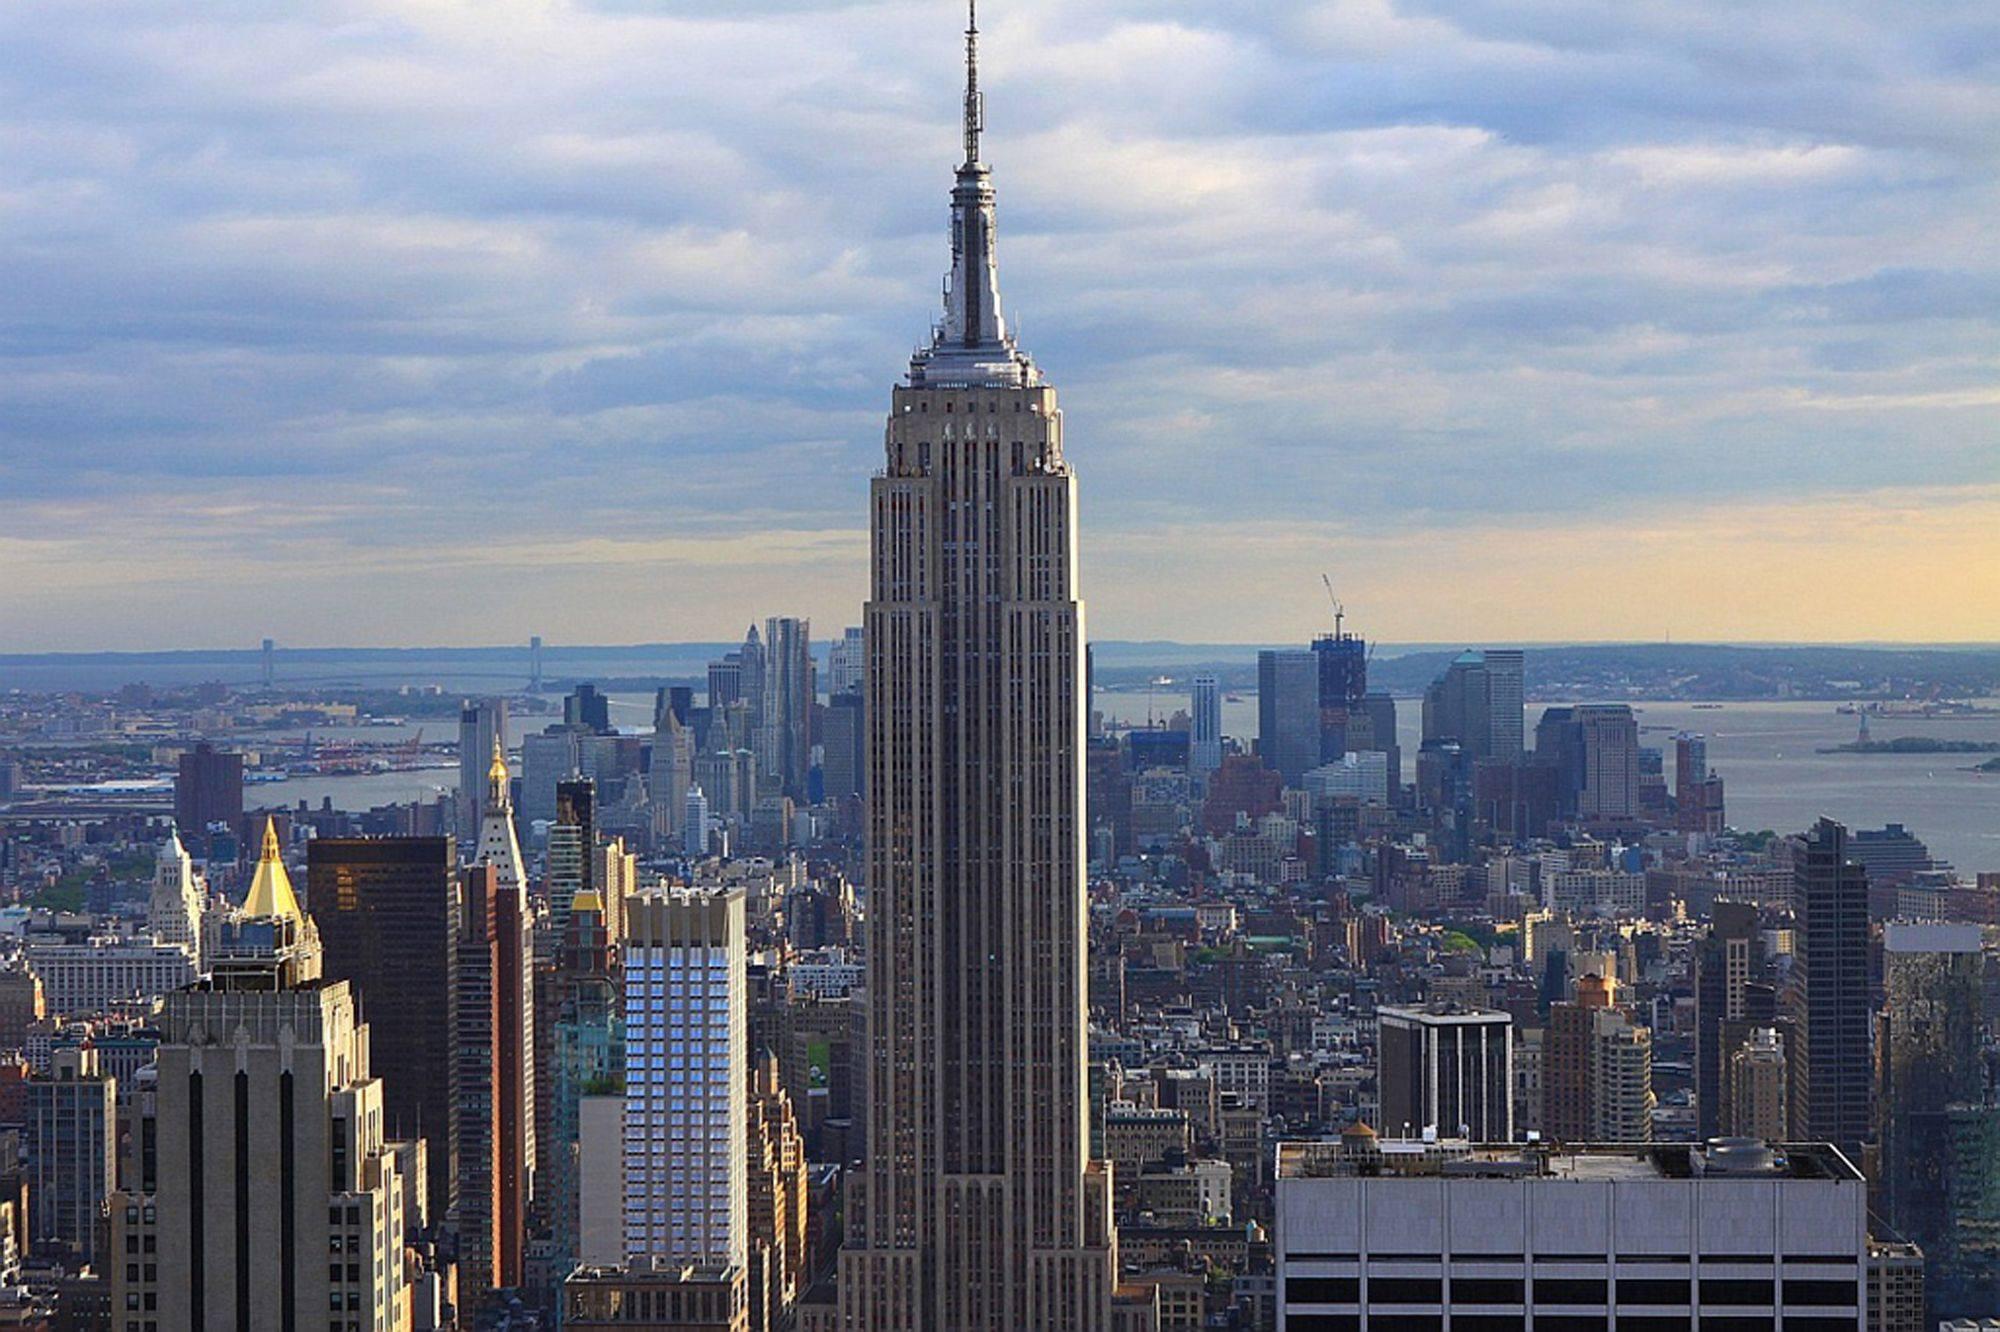 new york city street yellow cab